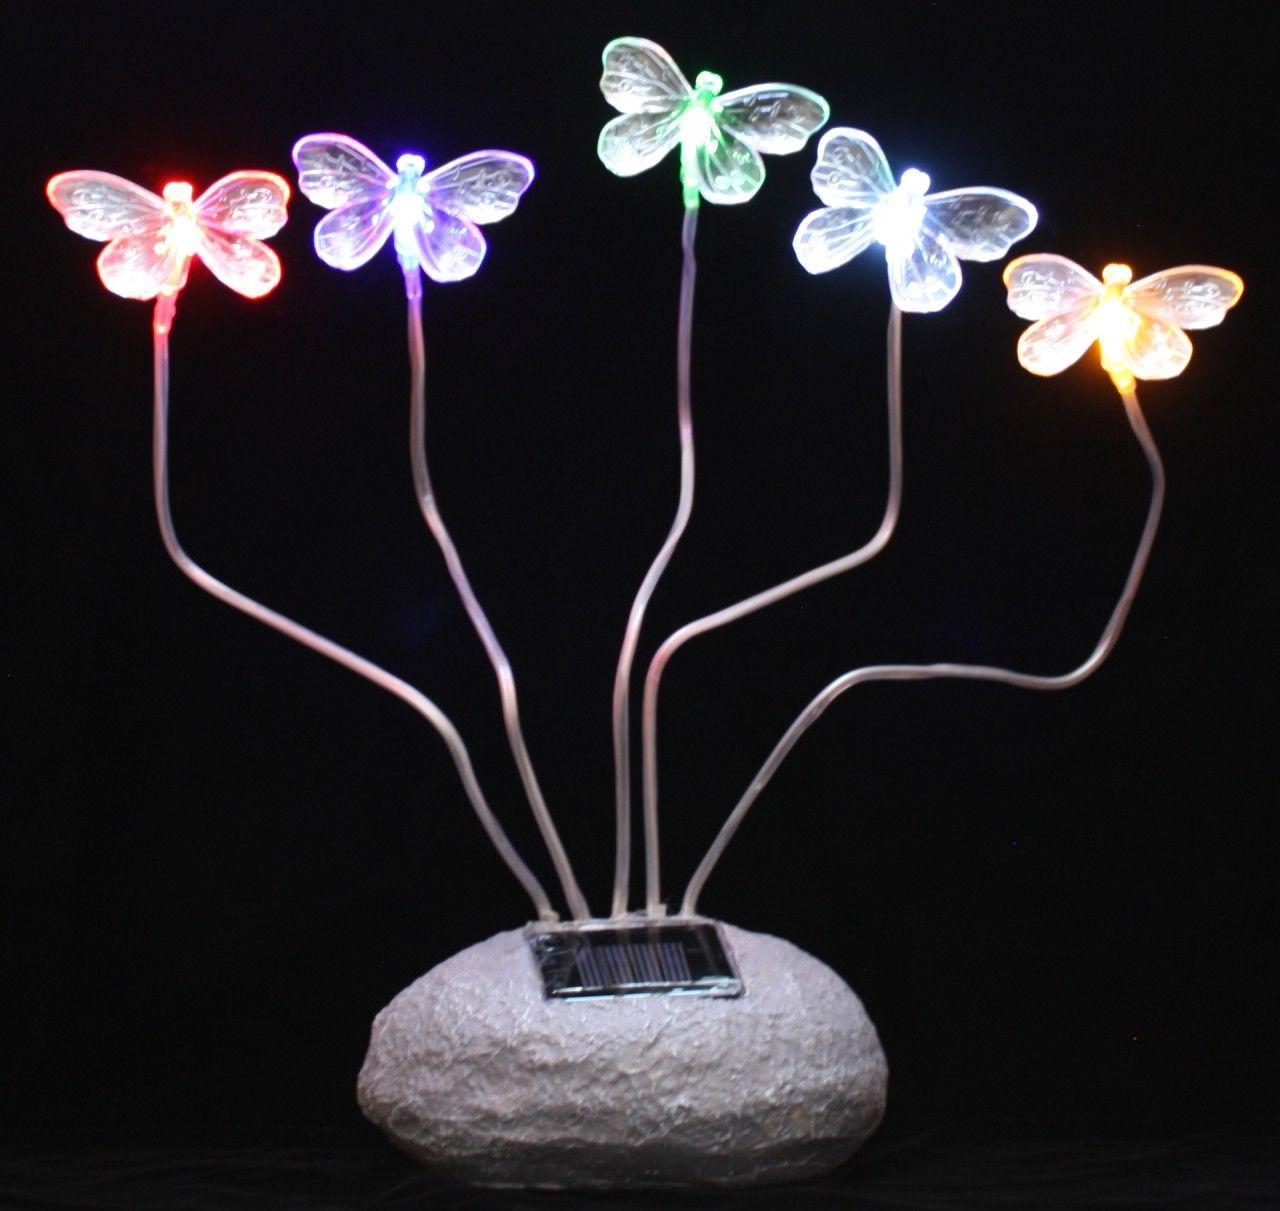 Solar Garden Decor Lights | Butterfly, Dragonfly, Fairies U0026 Flowers